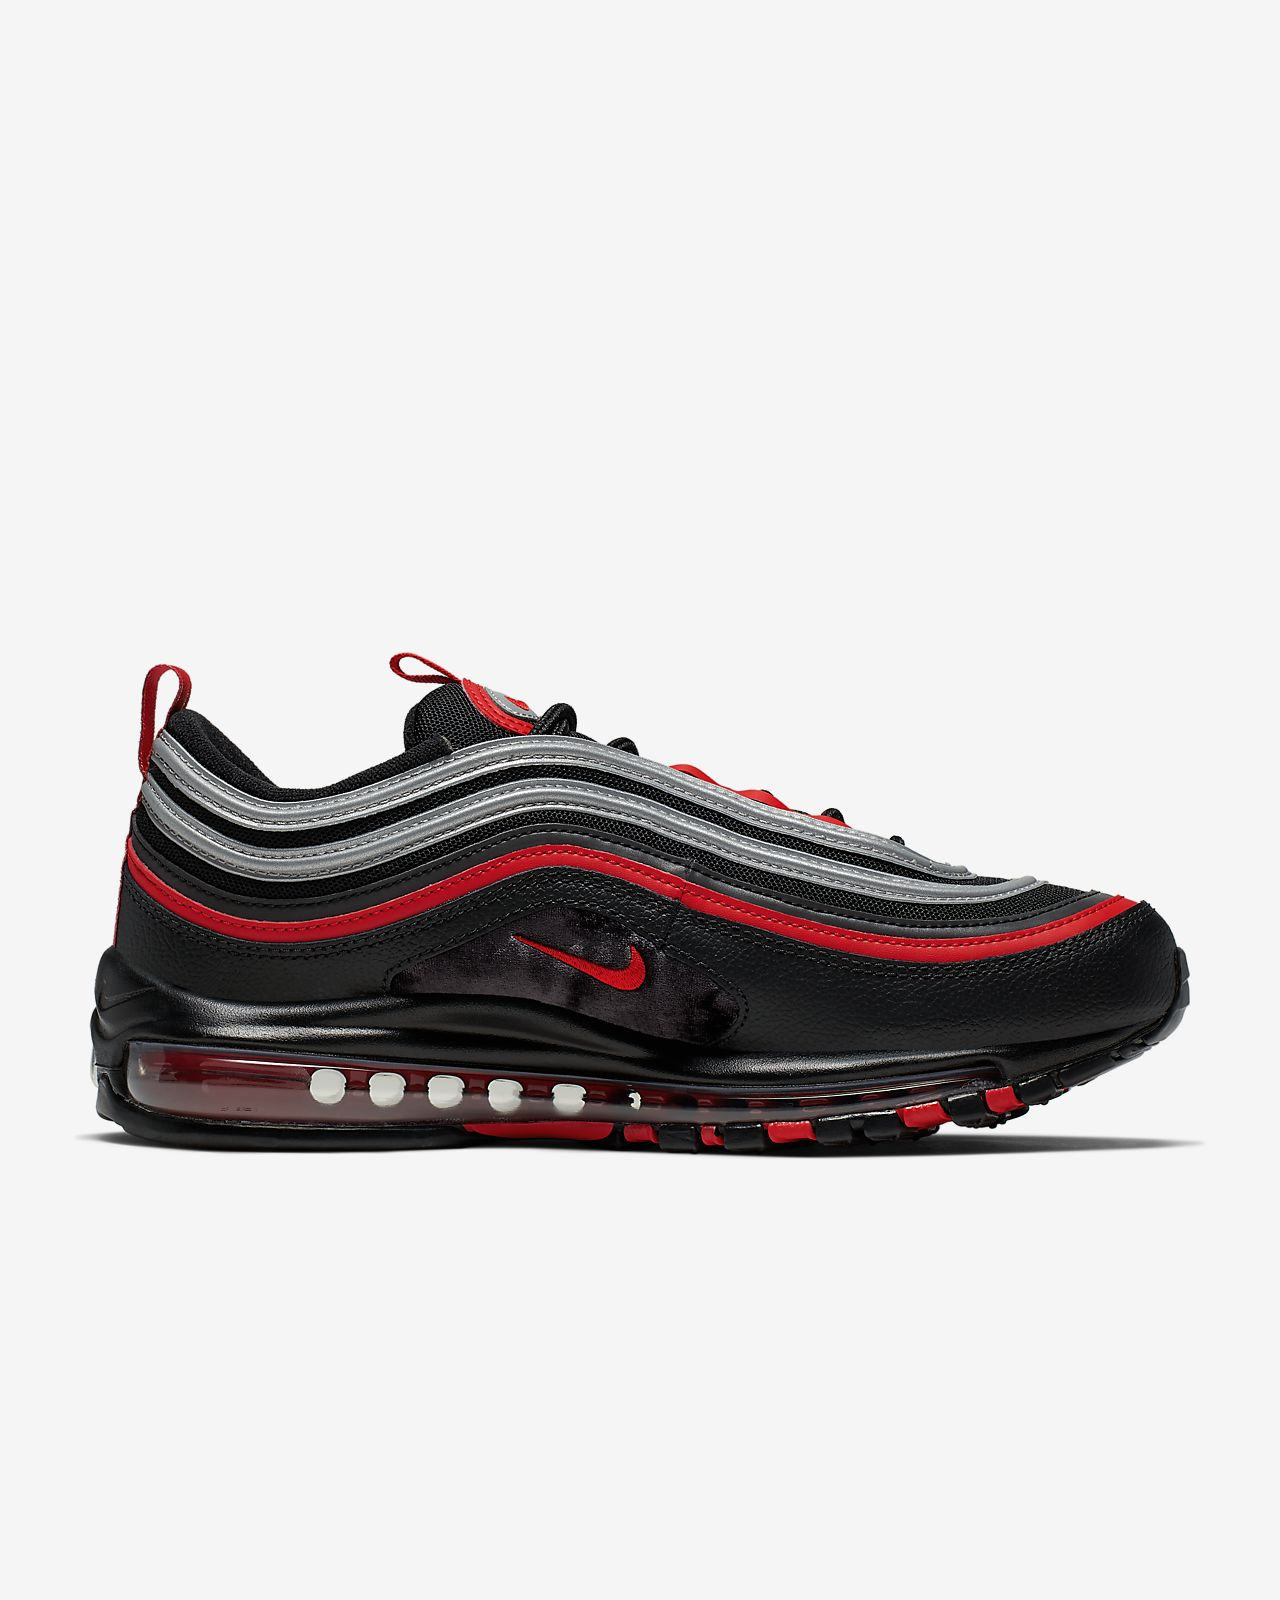 Mens Womens NIKE AIR MAX 97 OG Running Shoes QS White Wolf Grey Black 921826 101 921826 101